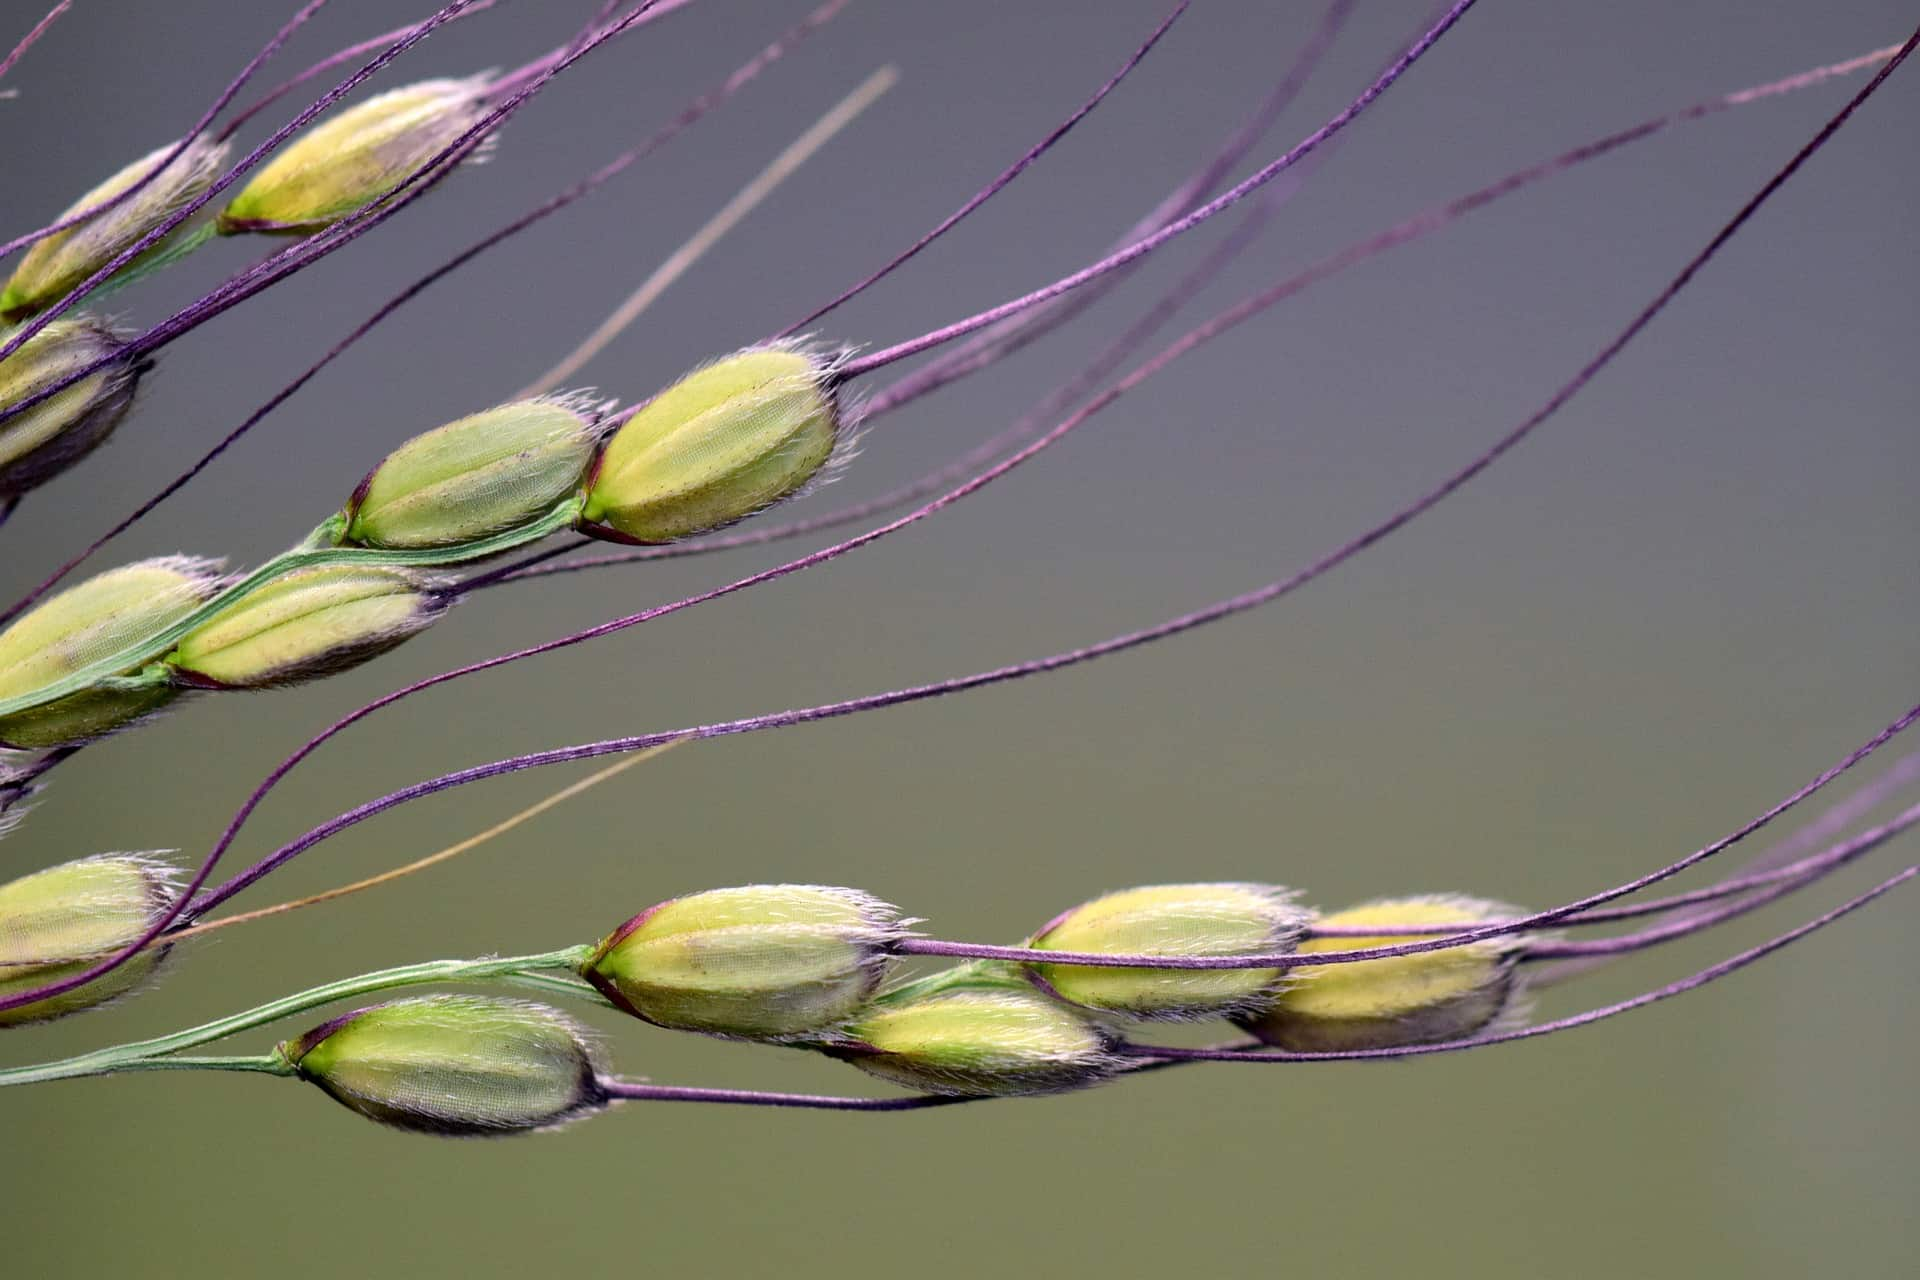 rice grain with husk